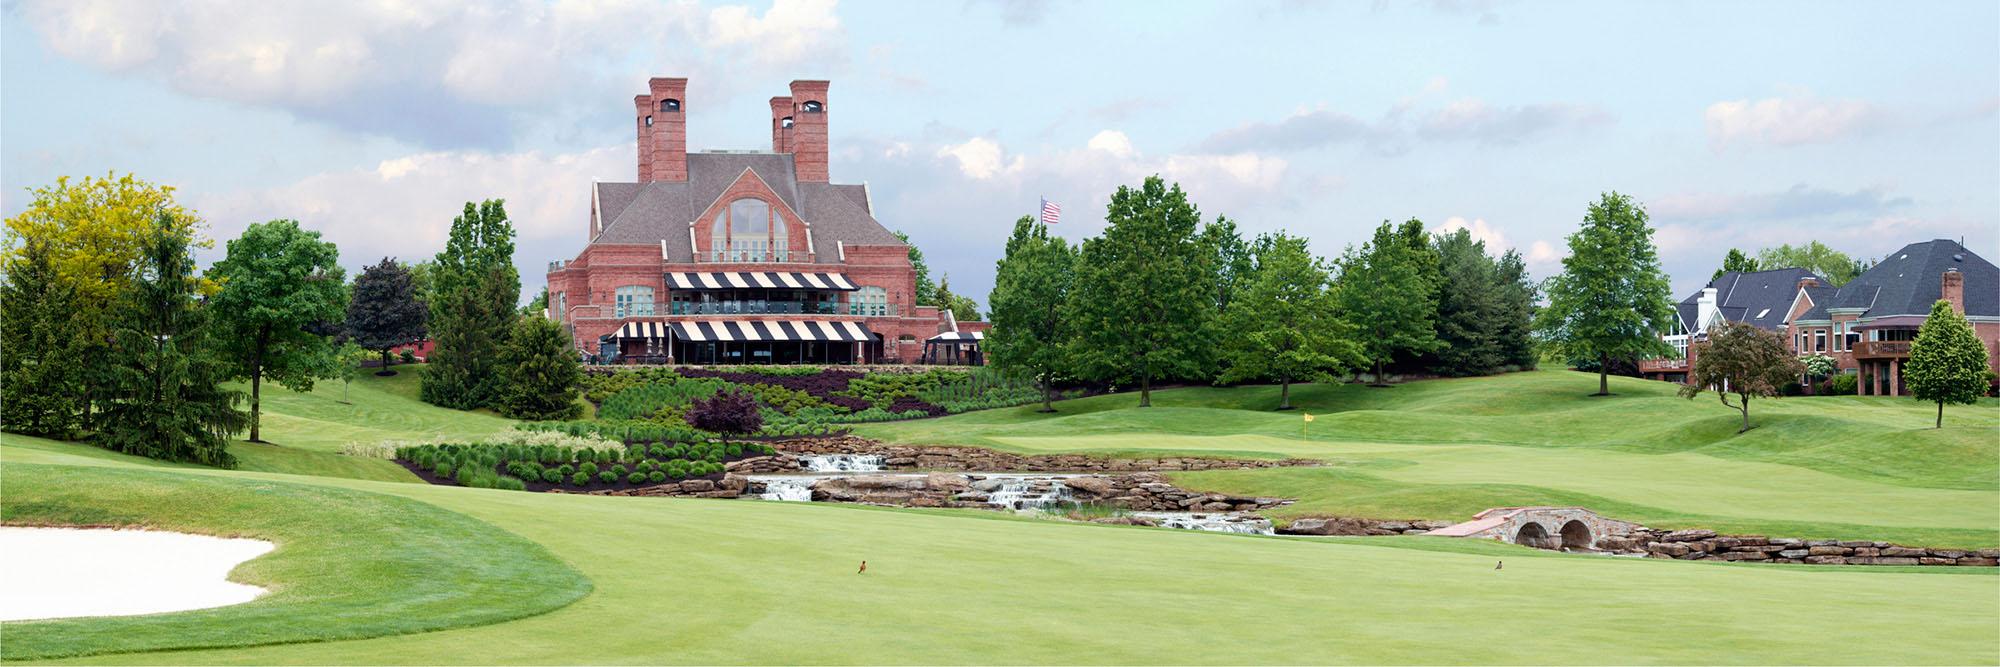 Golf Course Image - Nevillewood No. 18